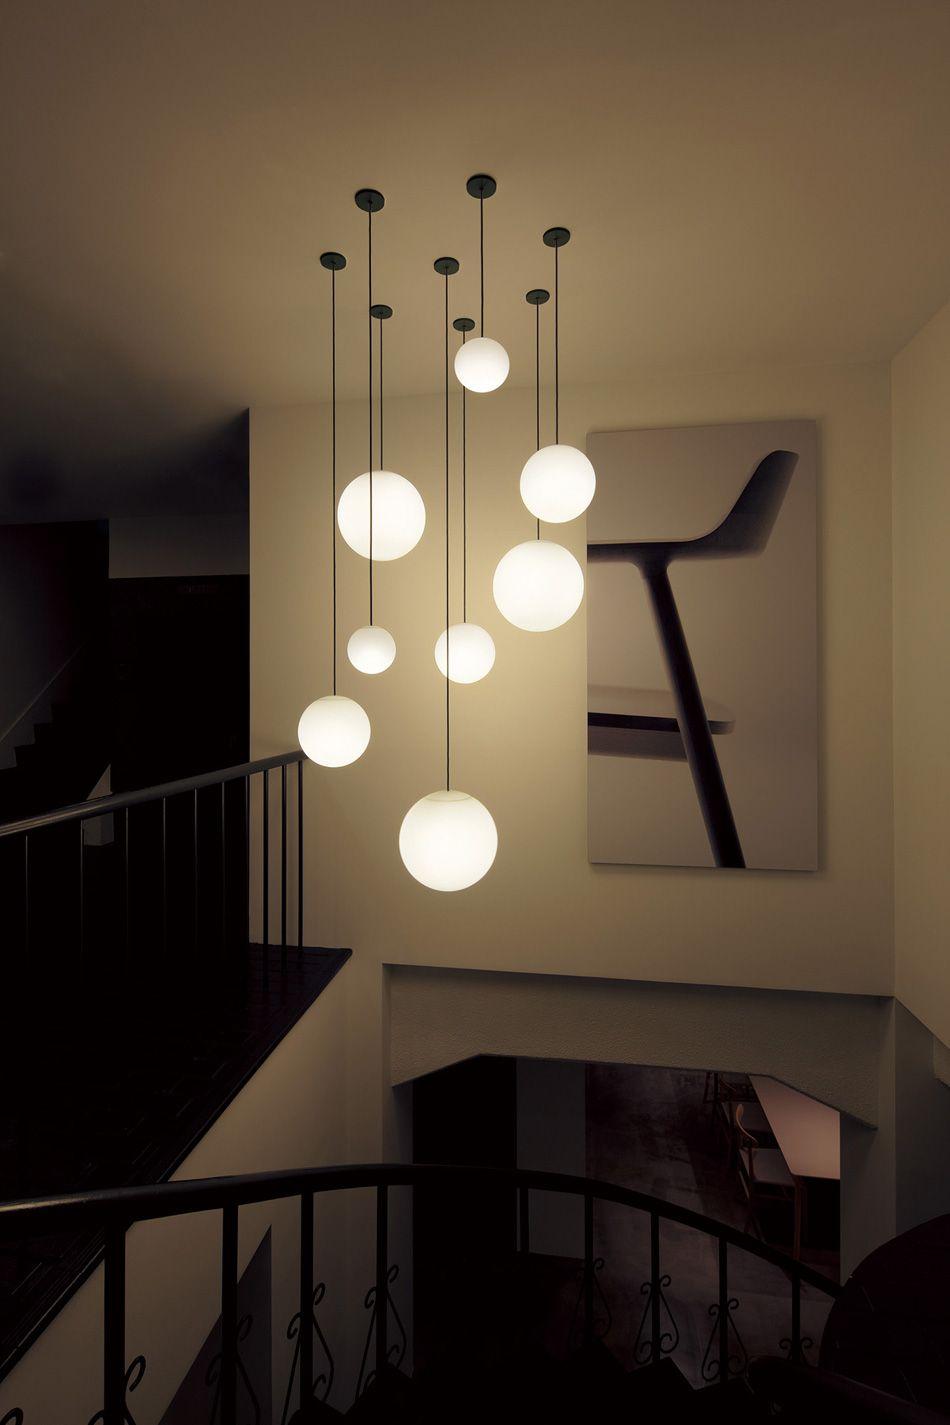 Naoto Fukasawa At Panasonic Shiodome Museum In Japan Interior Light Fixtures Living Room Lighting Kitchen Lighting Design